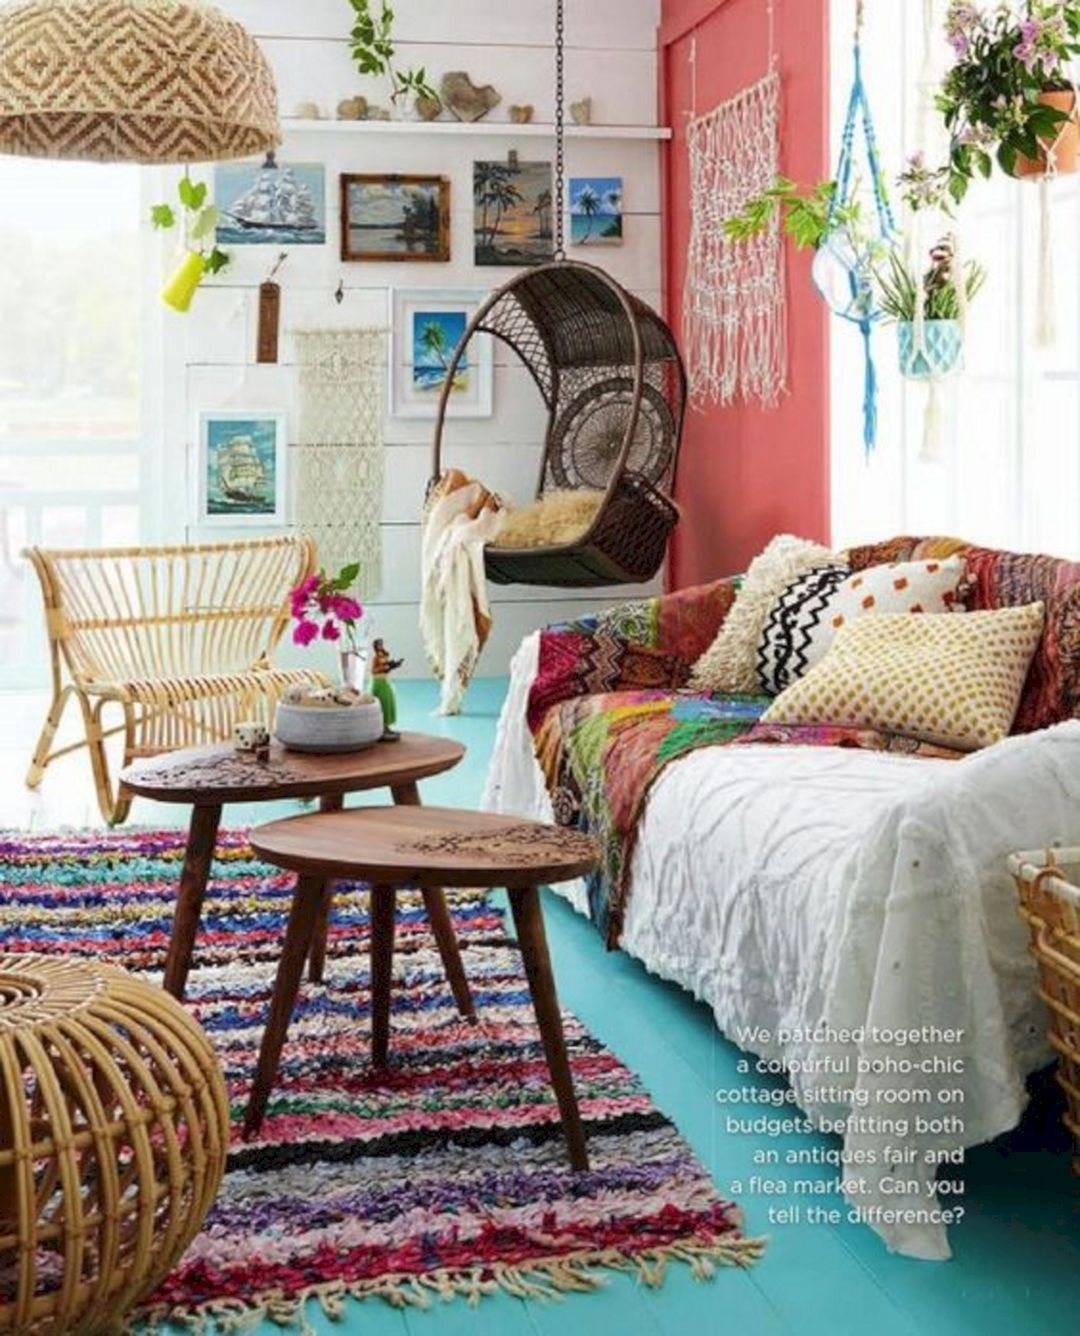 Top 25 Easy Diy Hippie Decor For Simple Home Interior Decorating Ideas Freshouz Com With Images Bohemian Style Living Room Bohemian Living Room Boho Living Room